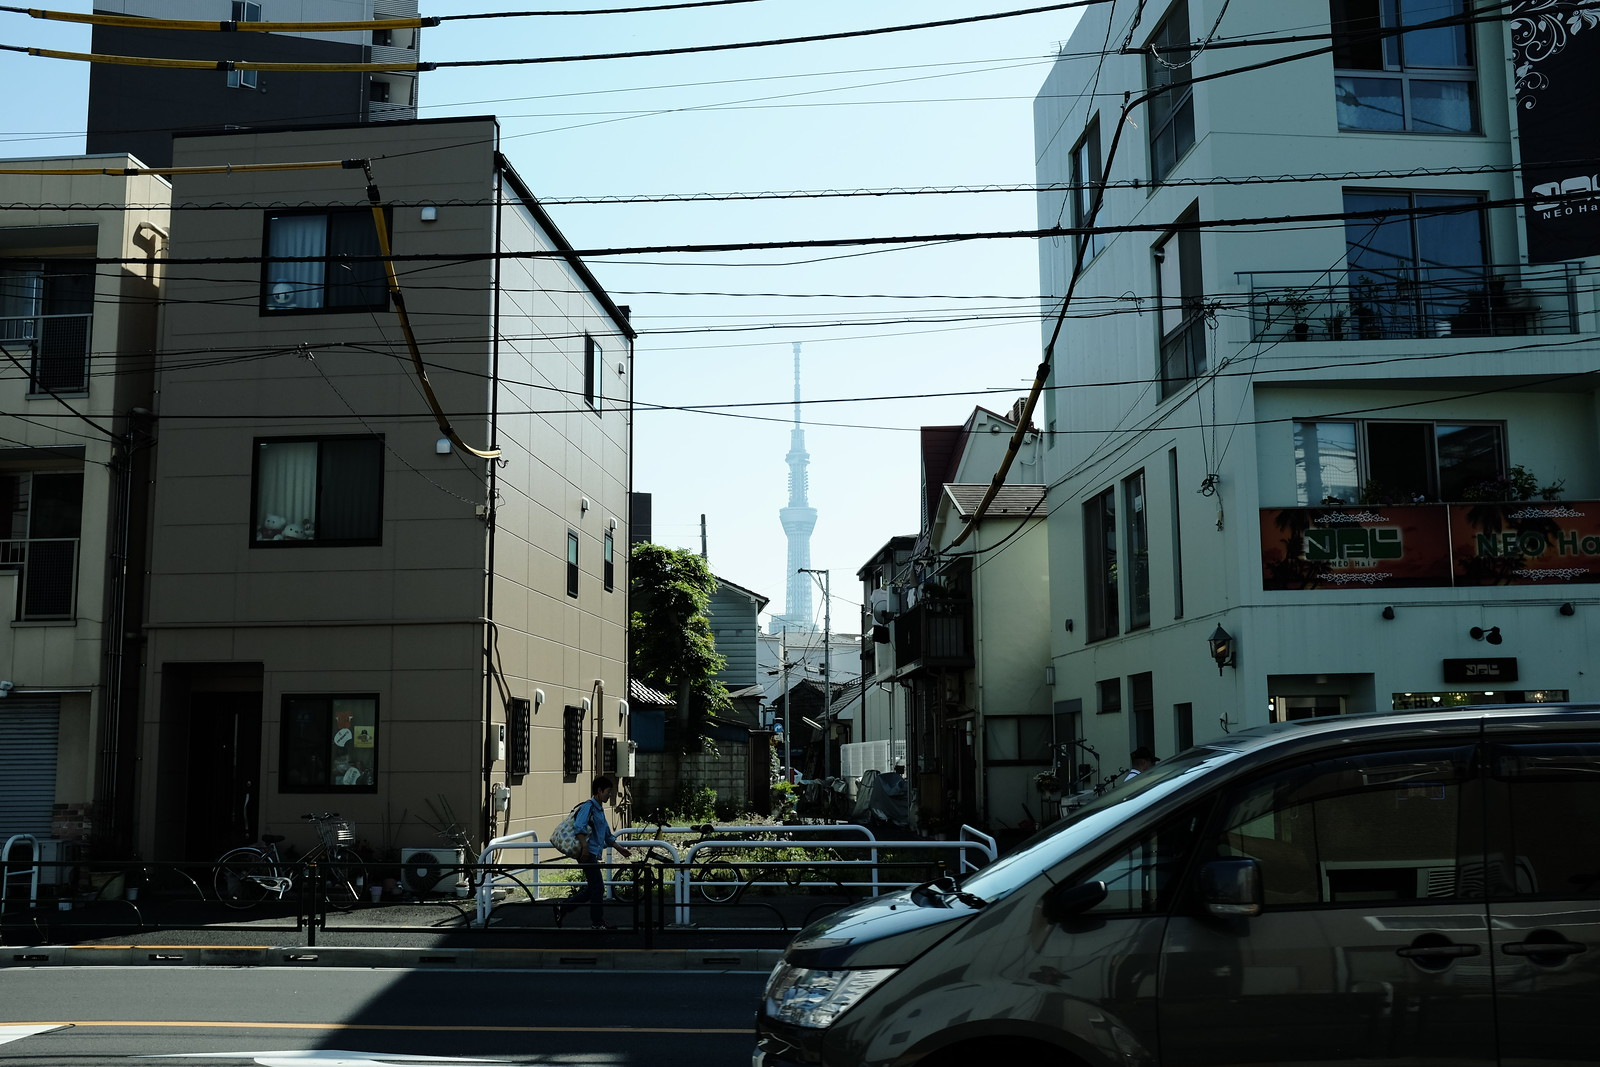 The Sumida-ku Tokyo taken by FUJIFILM X100S.